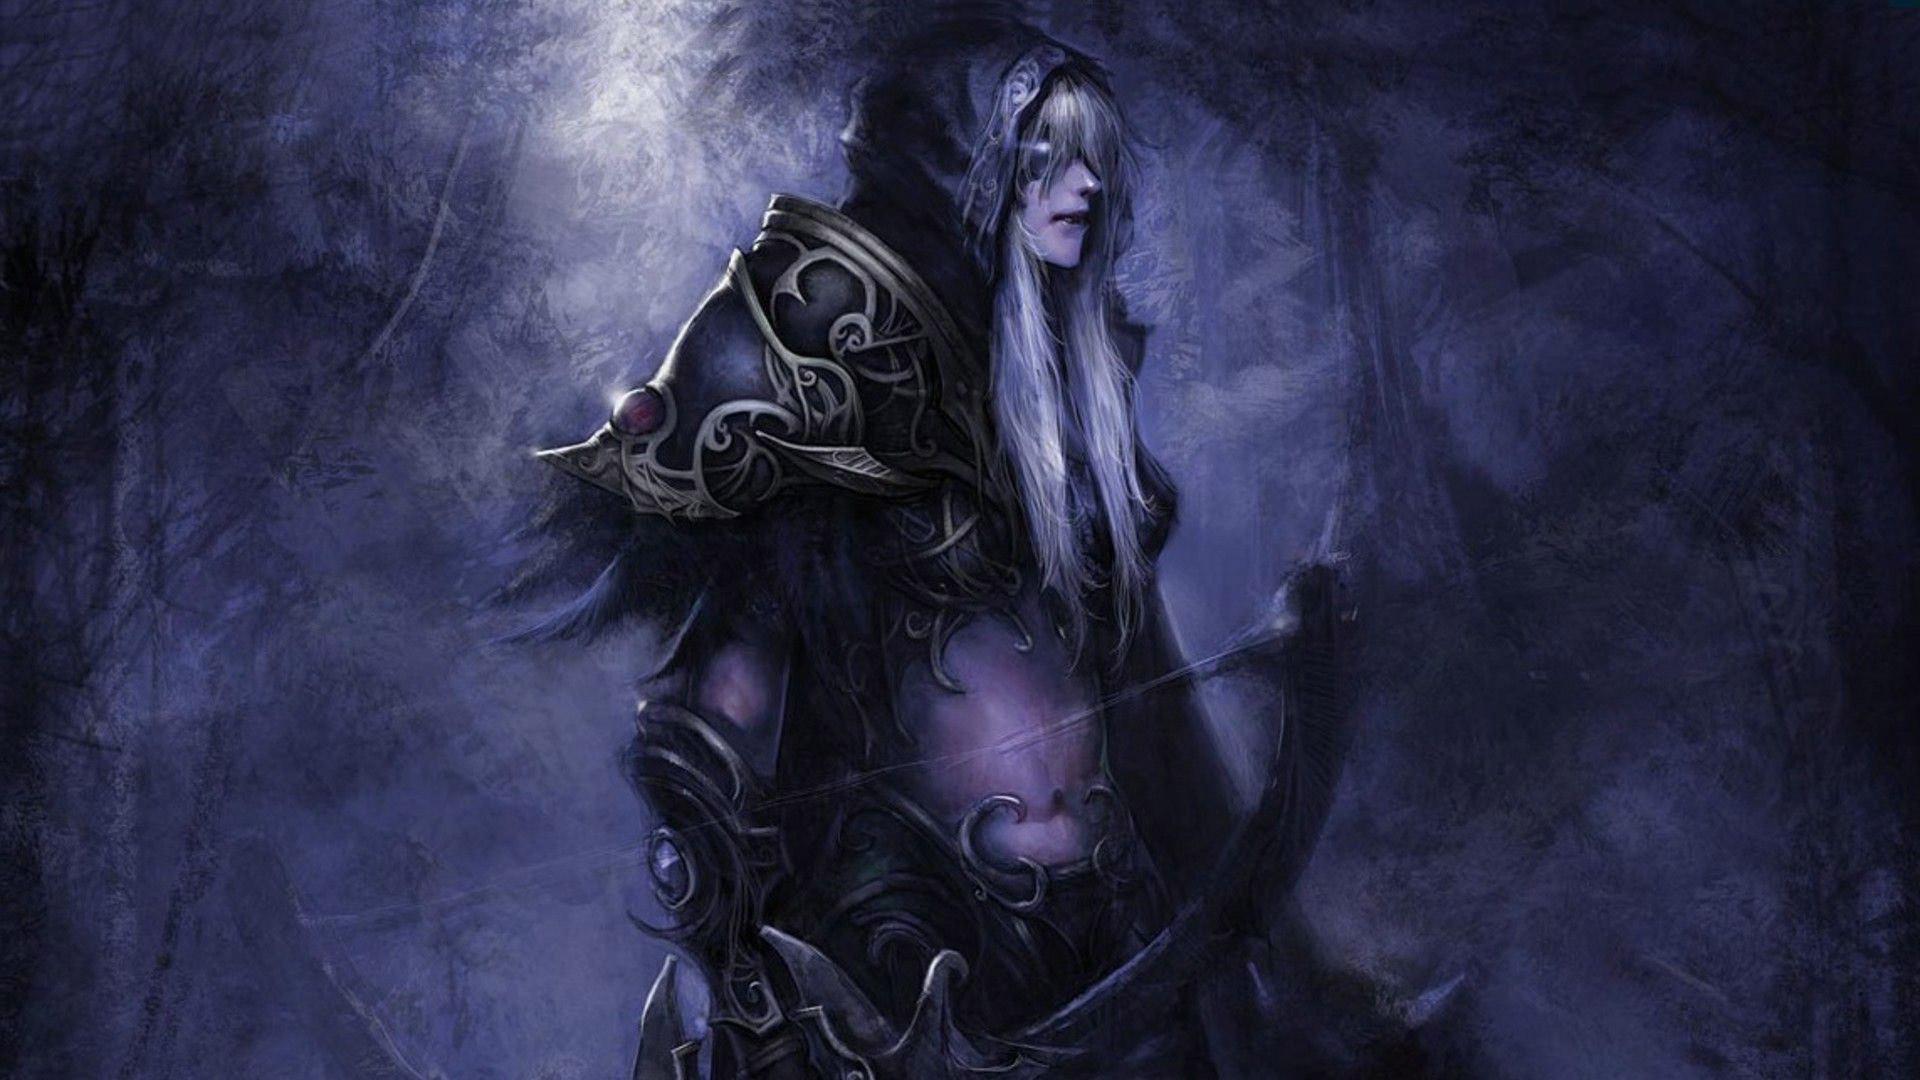 Night elf – World of Warcraft HD Wallpaper 1920×1080